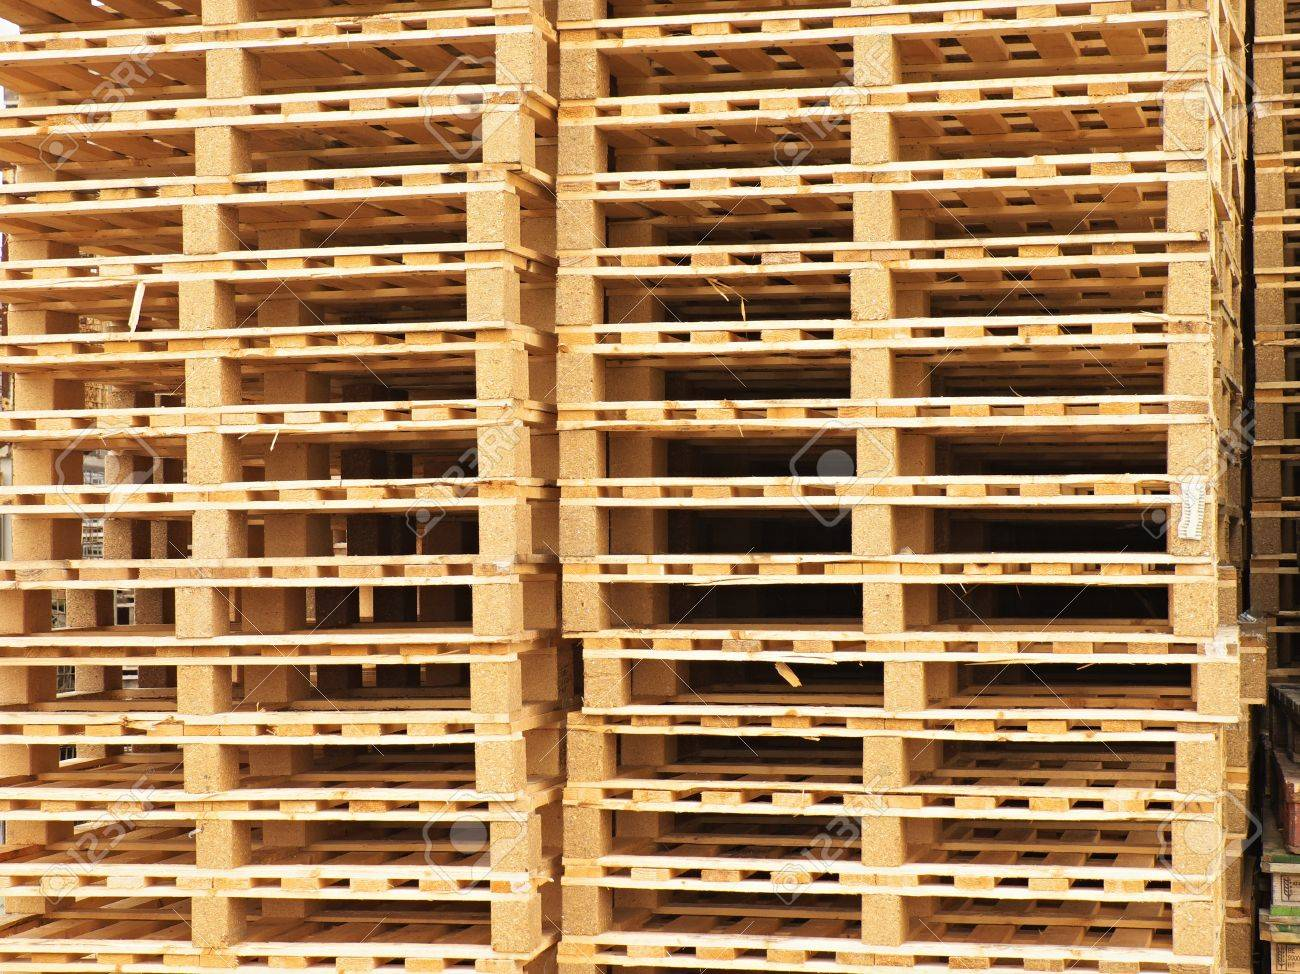 foto de archivo textura de euro palets de madera equipada en alta columna - Europalets